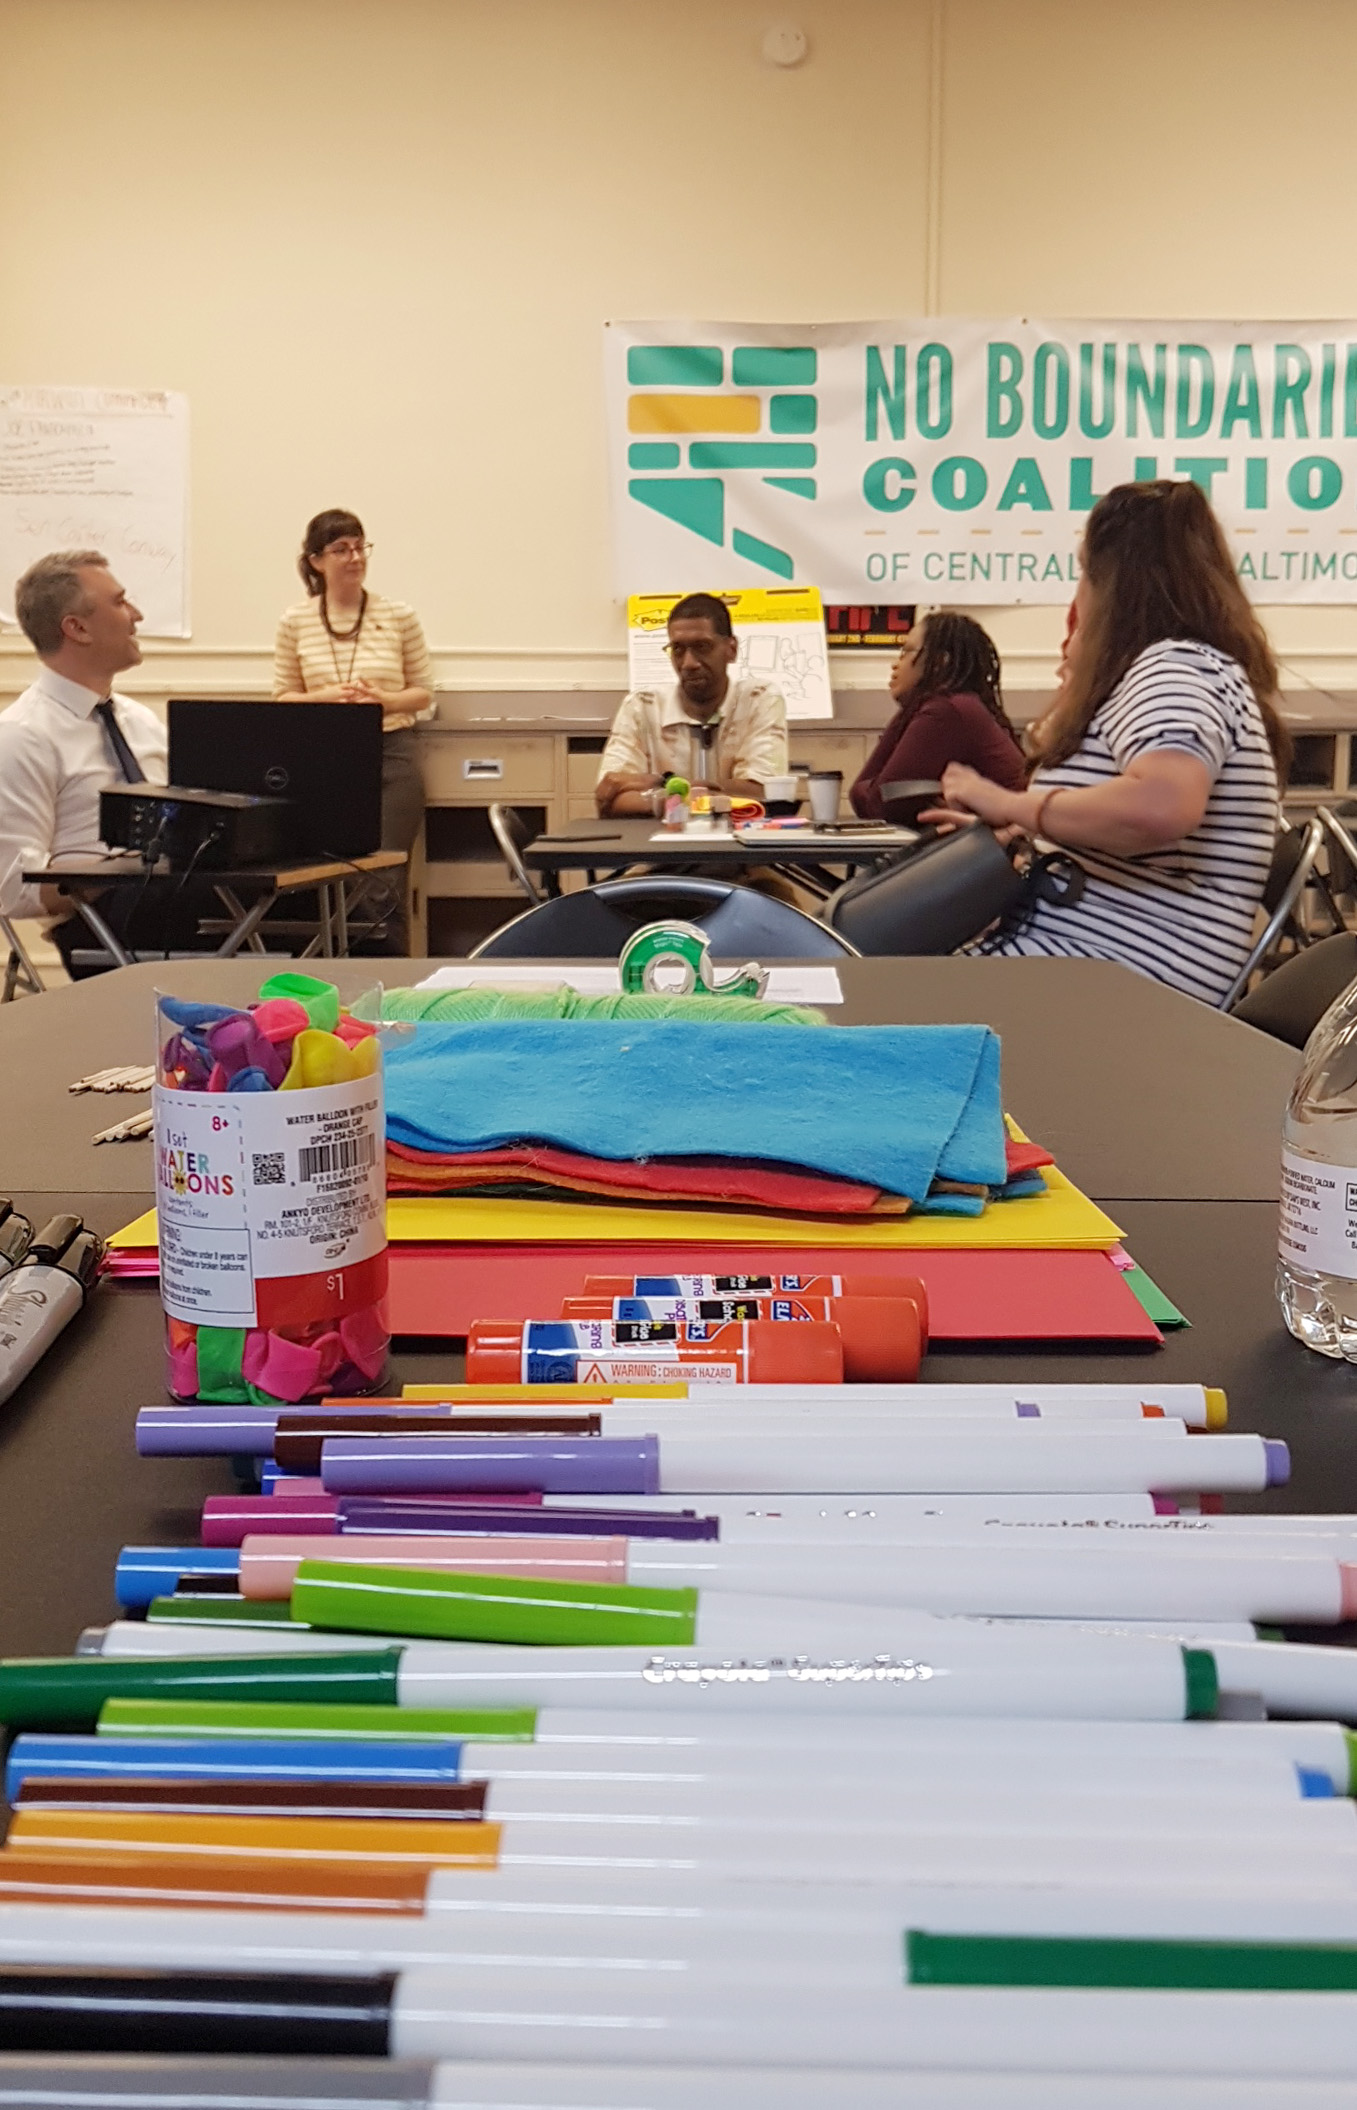 Prototyping a community nominations tool at No Boundaries Coalition